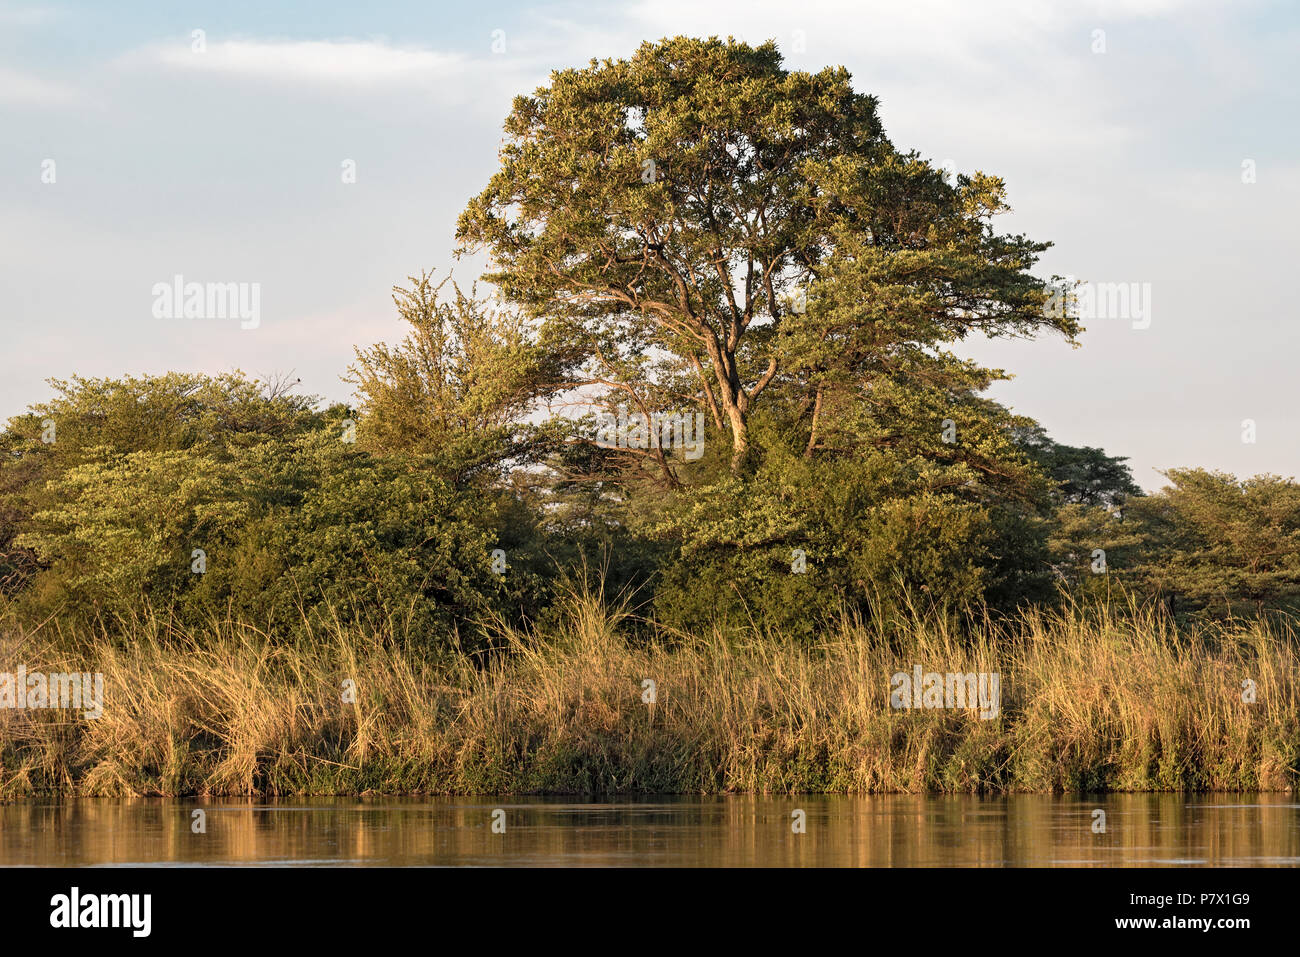 River bank of the Okavango River in Namibia - Stock Image